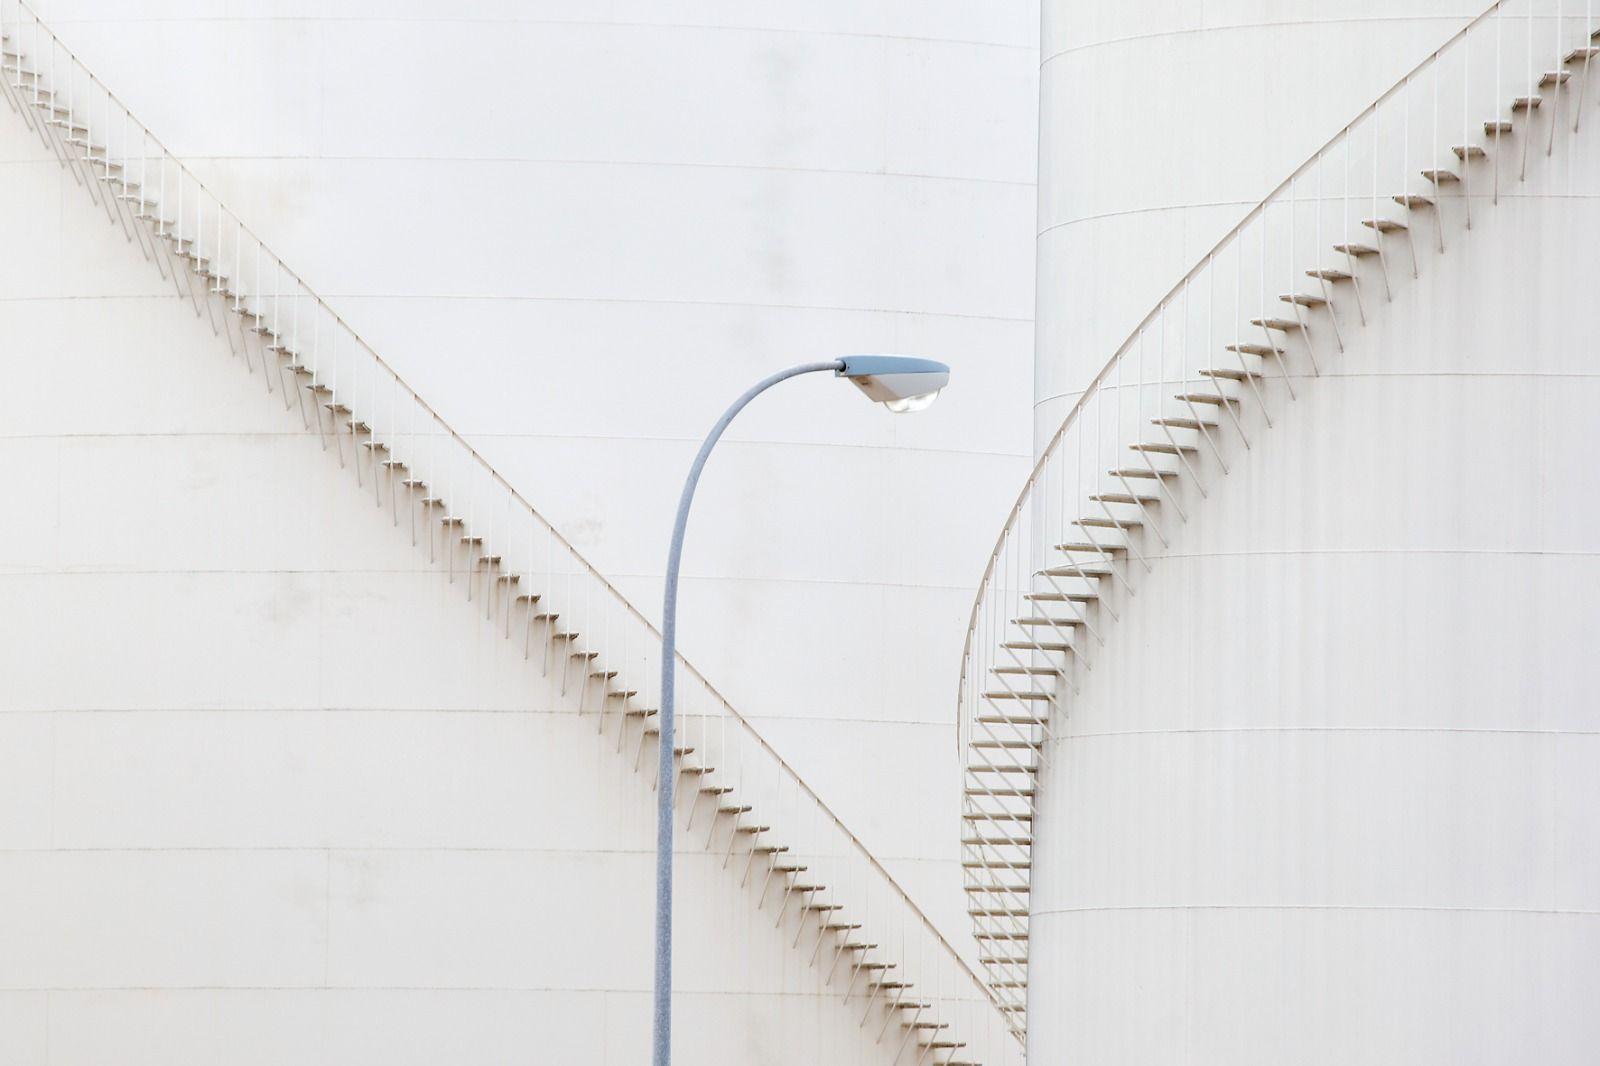 Foto de Mejor Fotografia 'Escaleras' de Miguel Planells Sauina